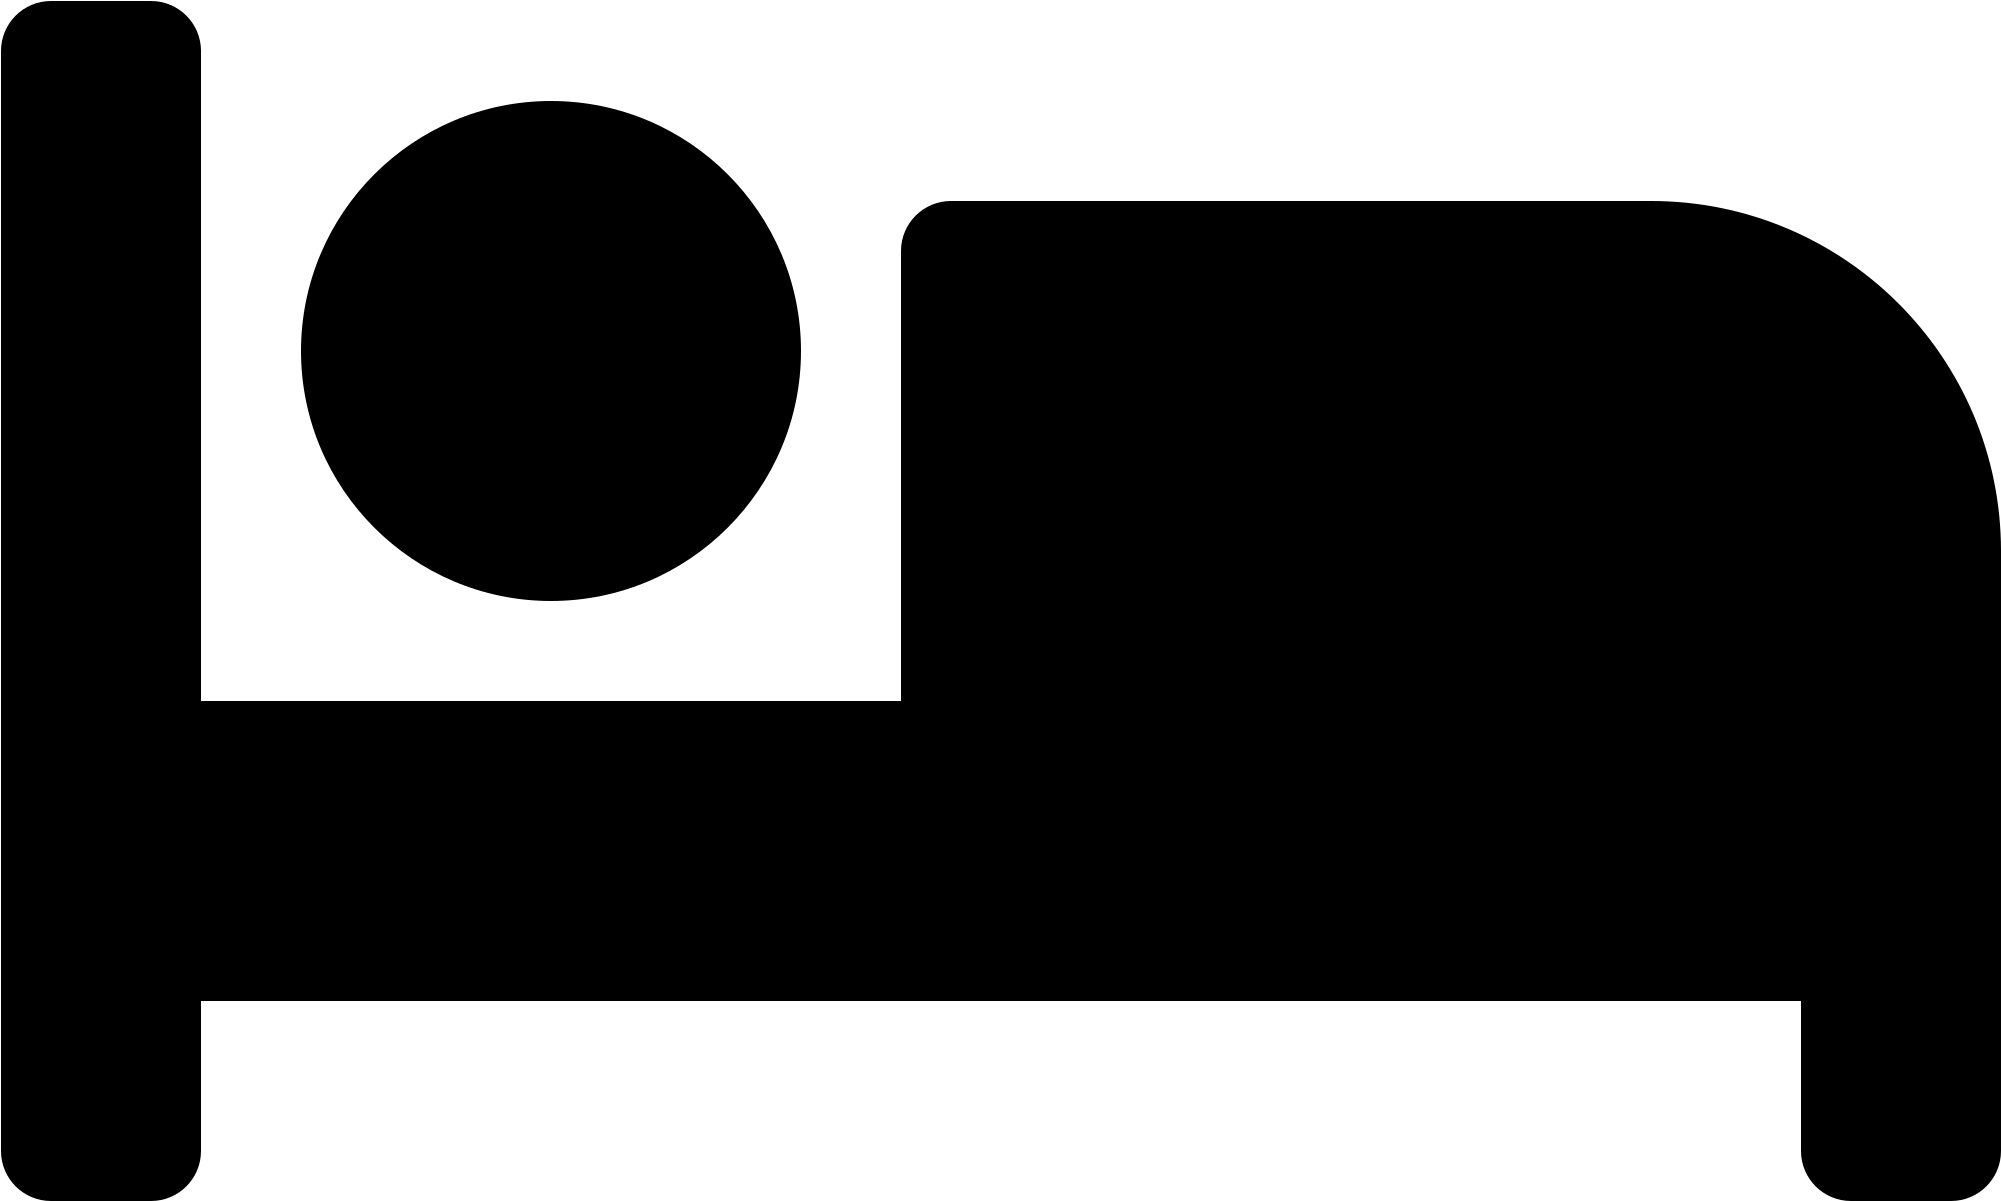 PngItem_5231596 (3)